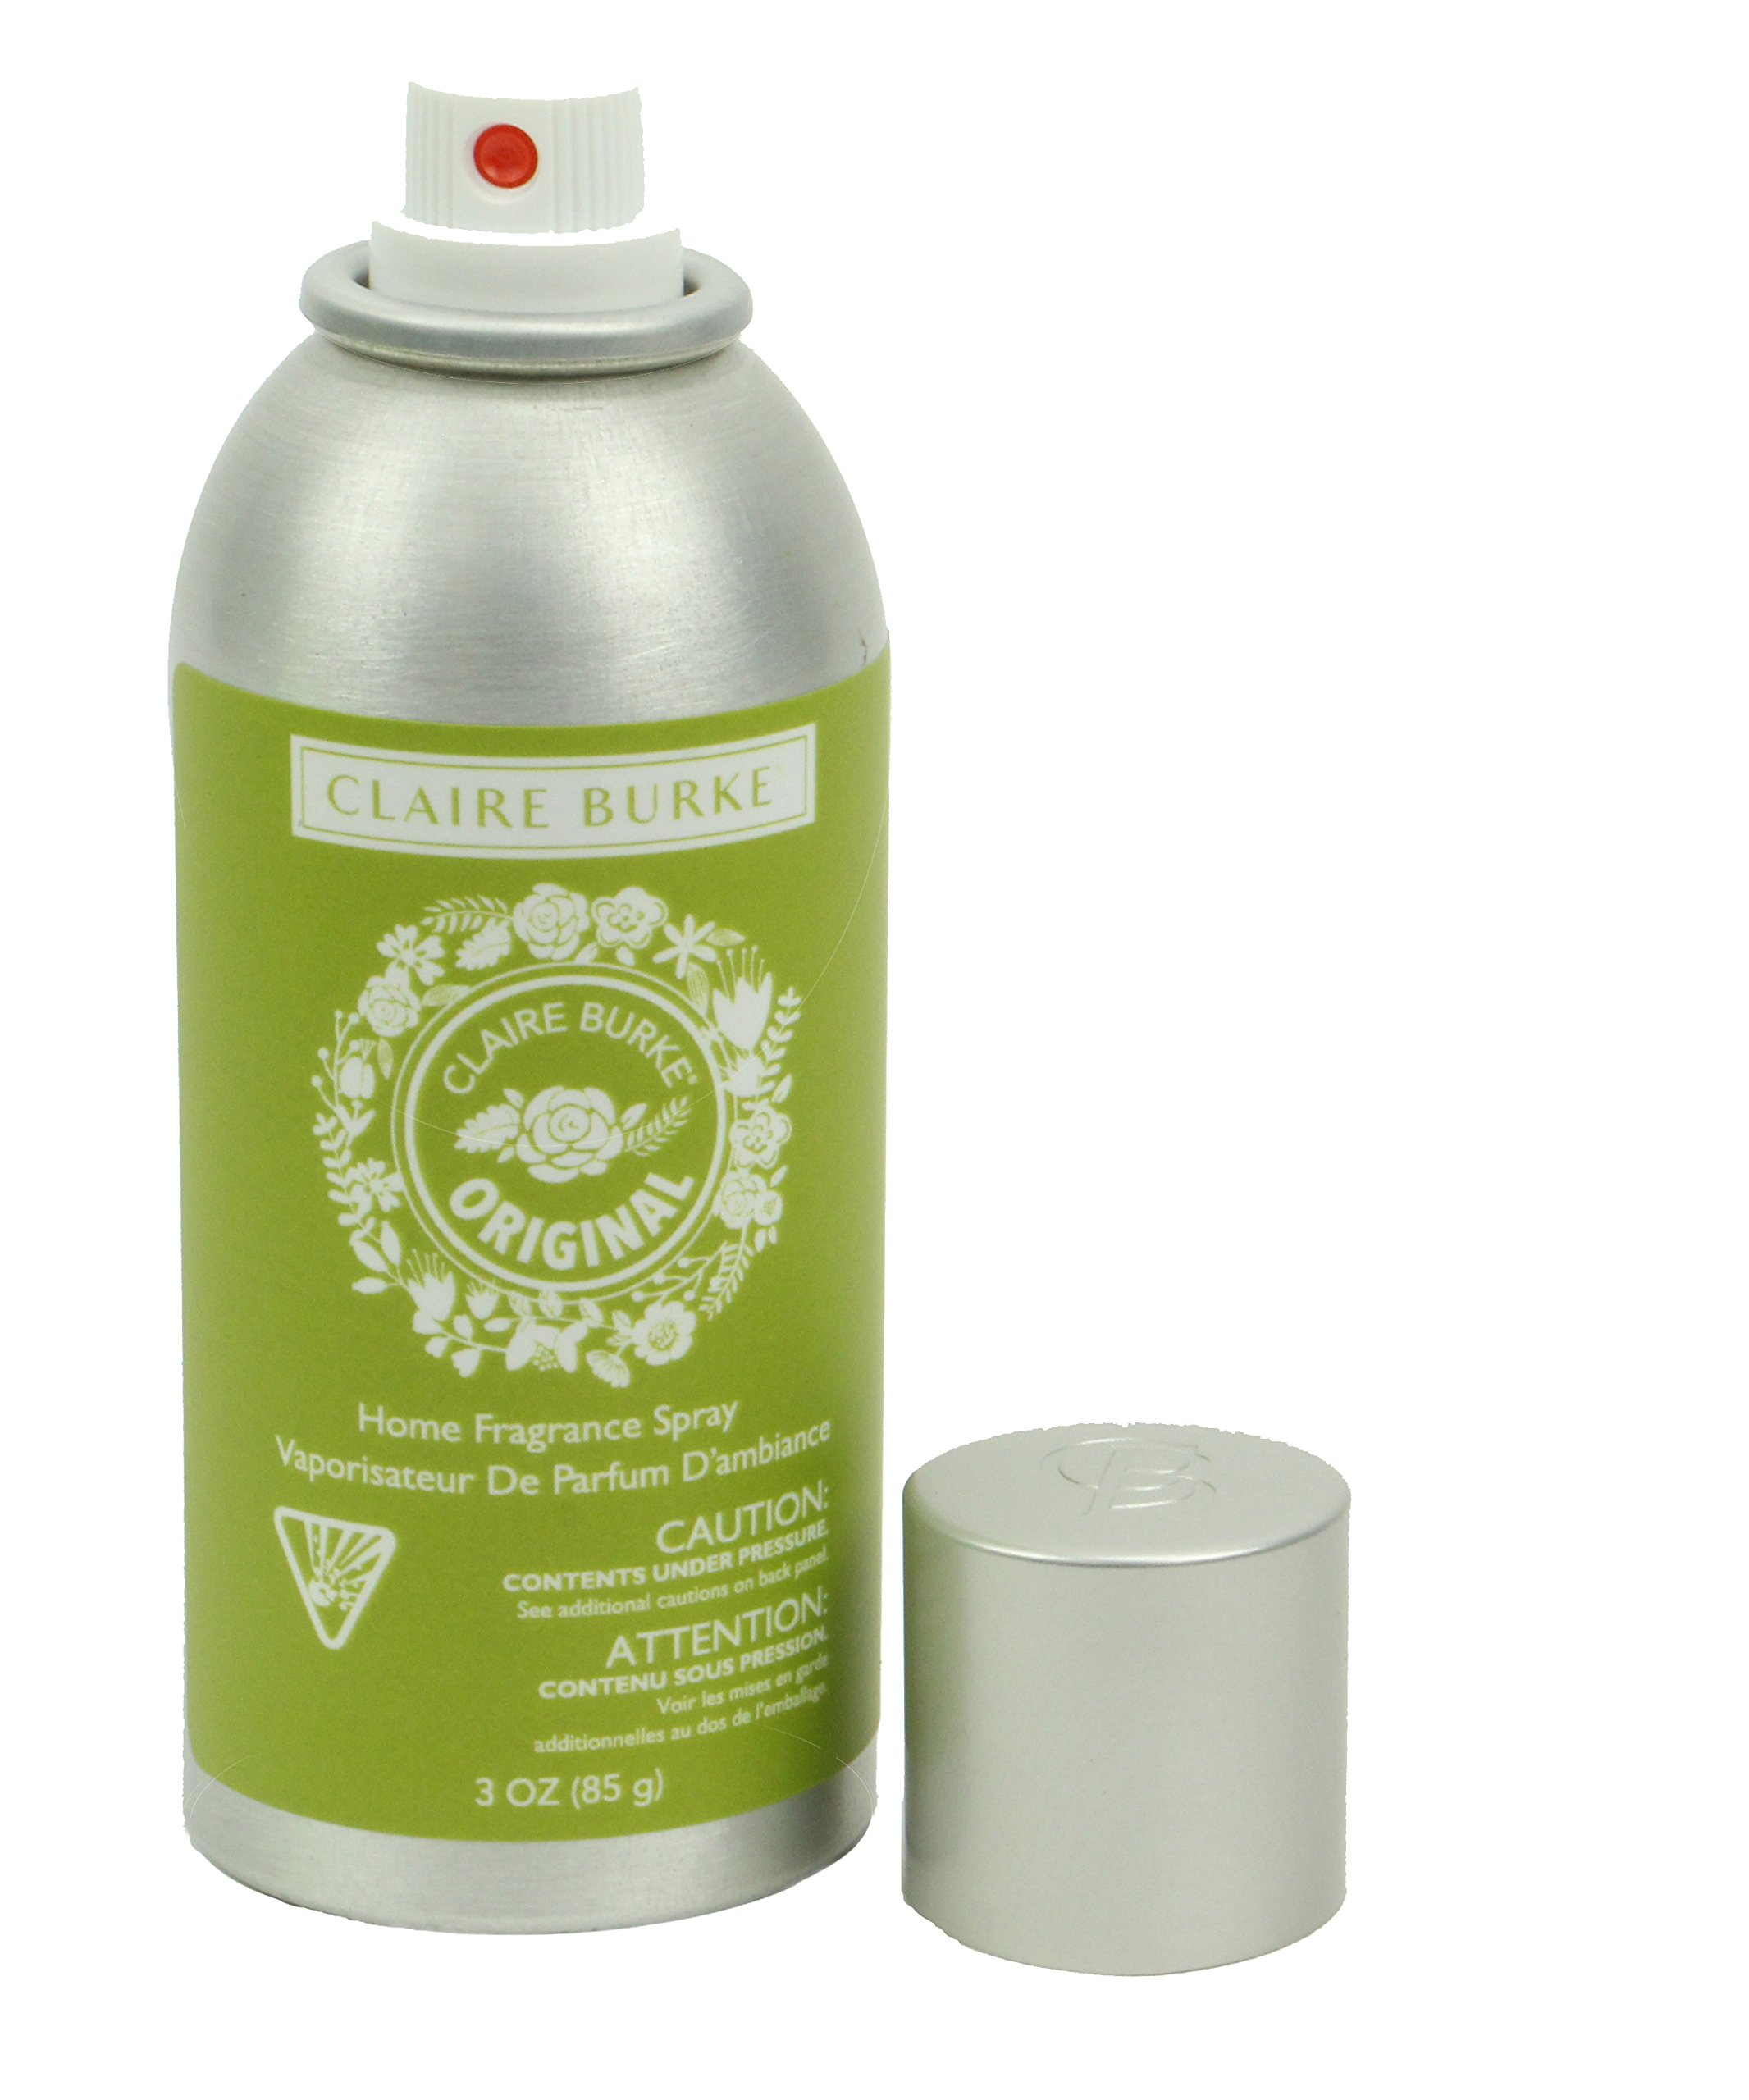 Claire Burke Original Home Fragrance Spray, 3 oz (6) by Claire Burke (Image #3)